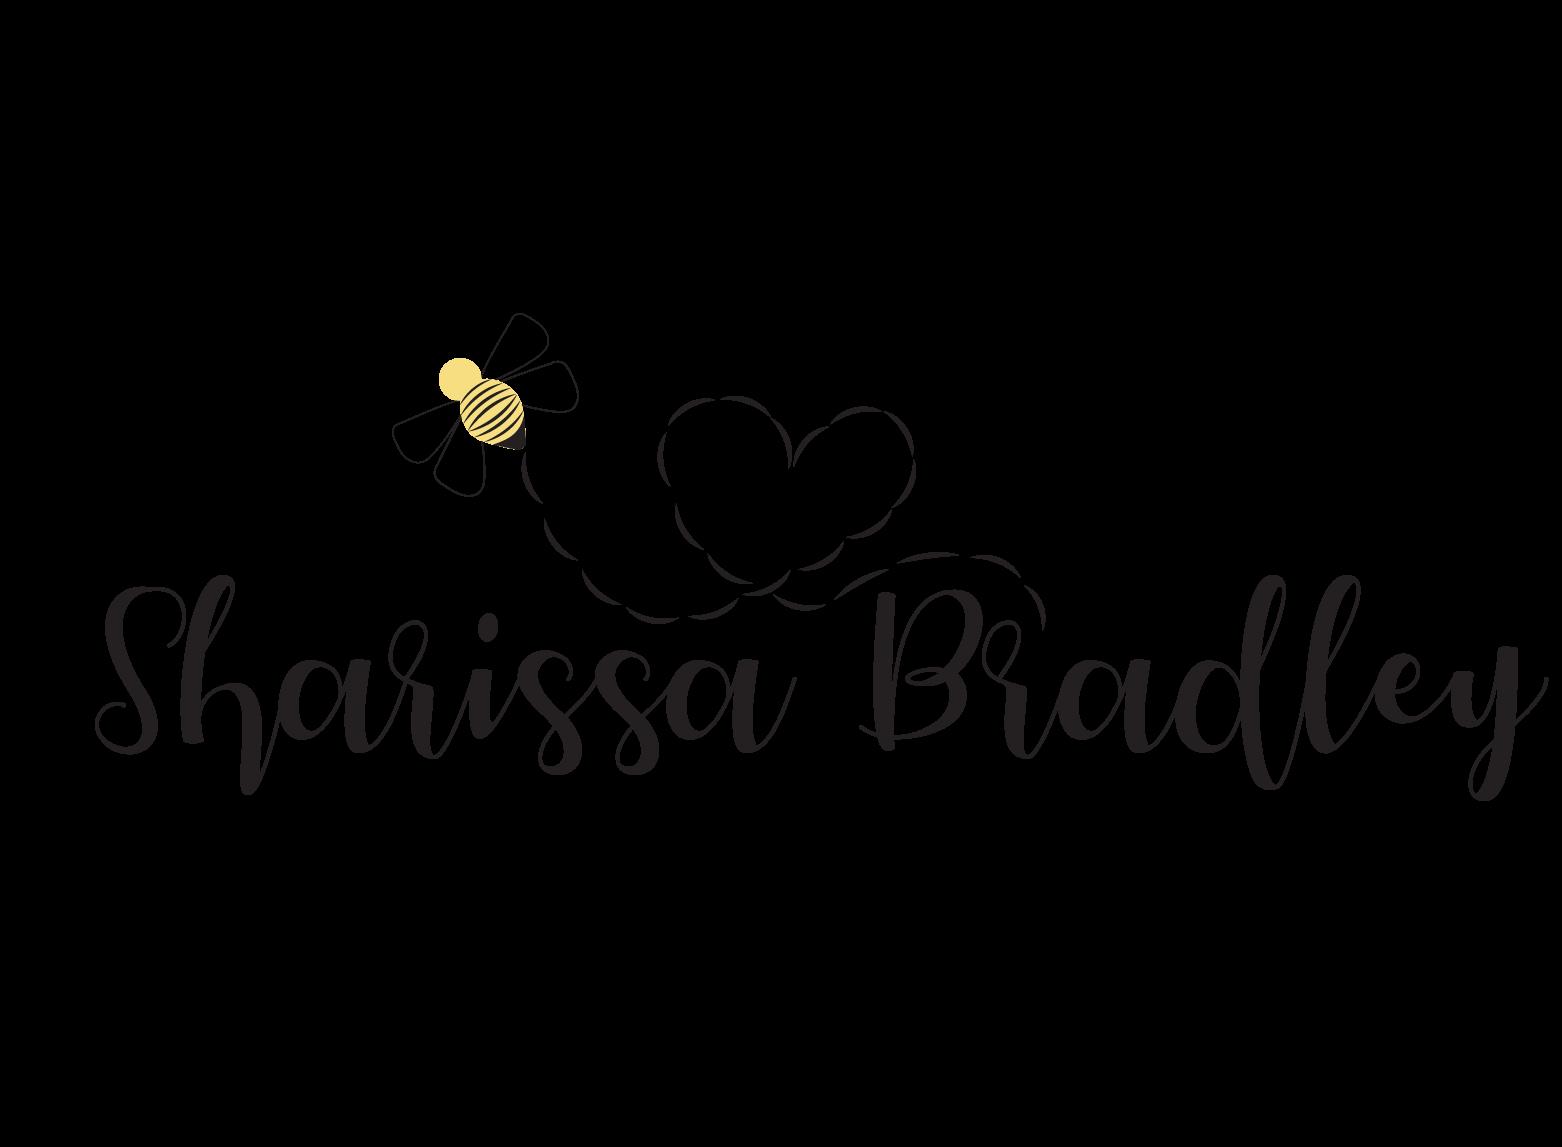 Sharissa Bradley